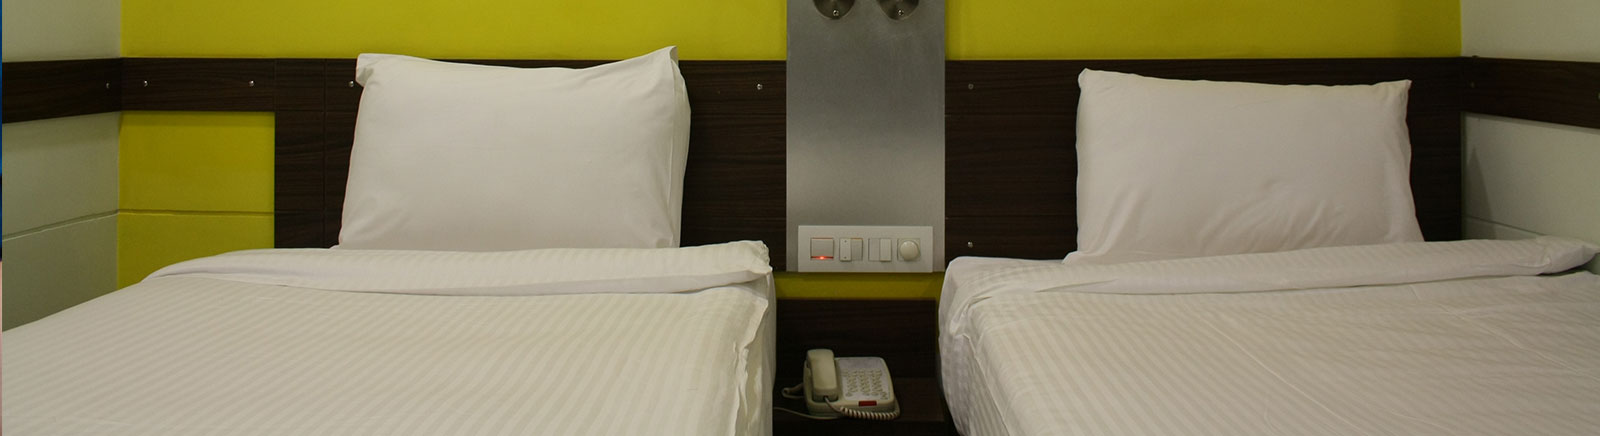 Rooms of Ginger Faridabad